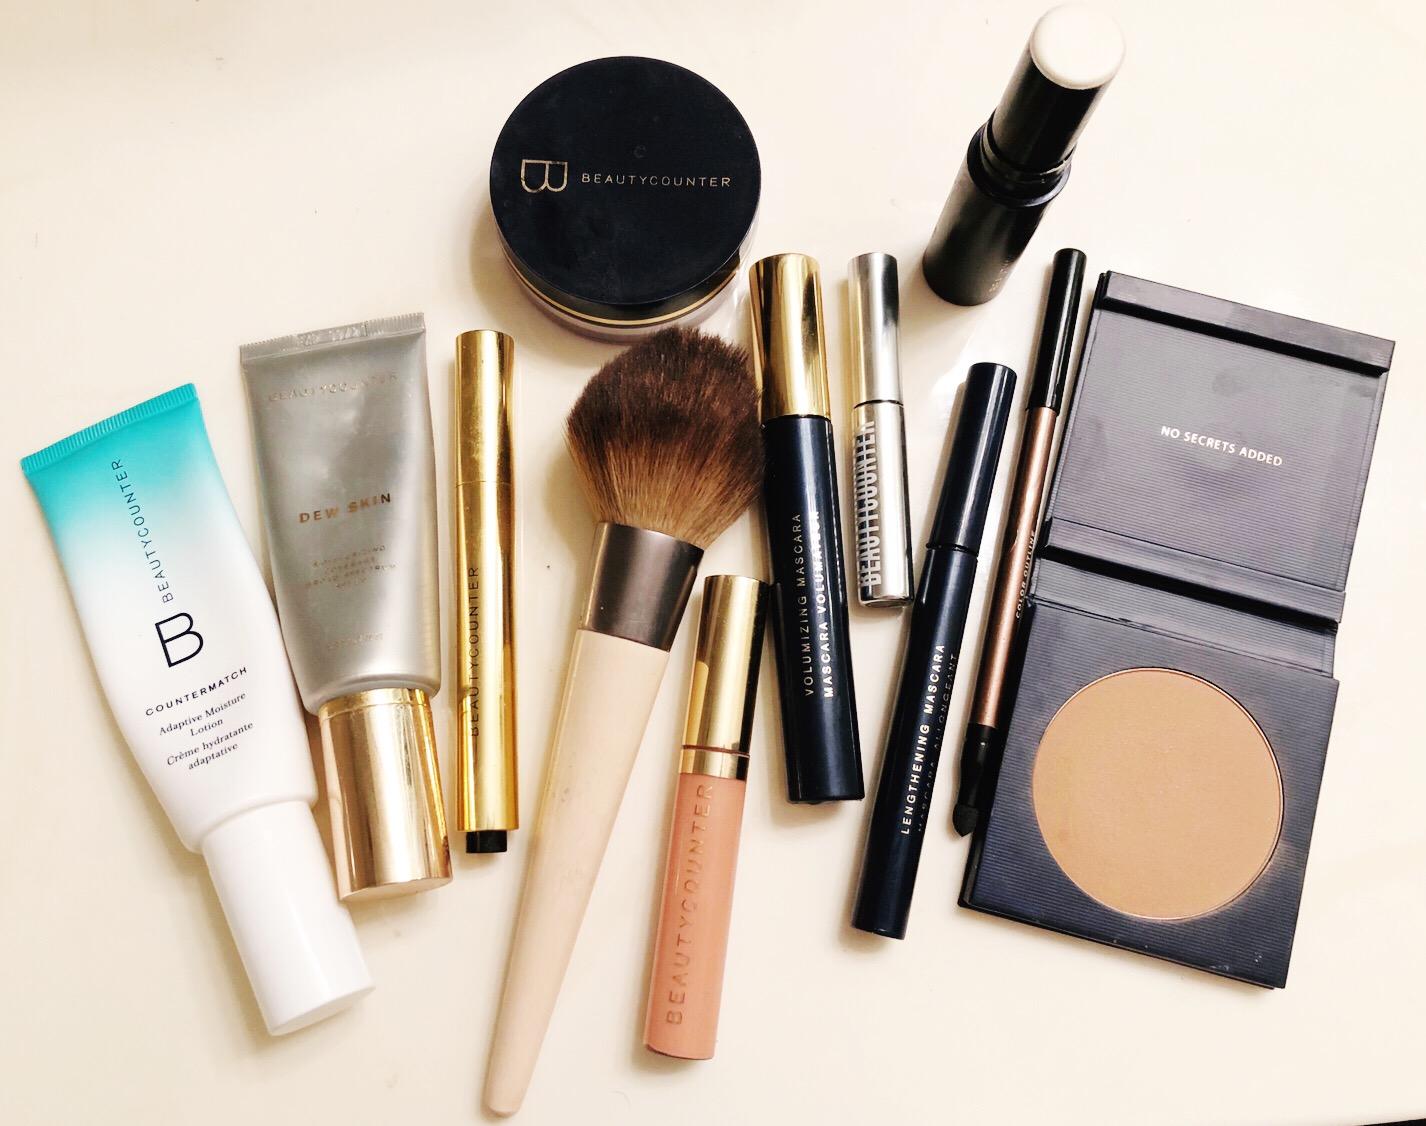 Left to right:    Adaptive Moisturizer   ,    Dew Skin   ,    Concealer Pen   ,    Mattifying Powder   ,    Lip Gloss,       Volumizing Mascara   ,    Brow Gel   ,    Lengthening Mascara   ,    Eyeliner Pen   ,    Highlighter Stick   ,    Bronzer   .